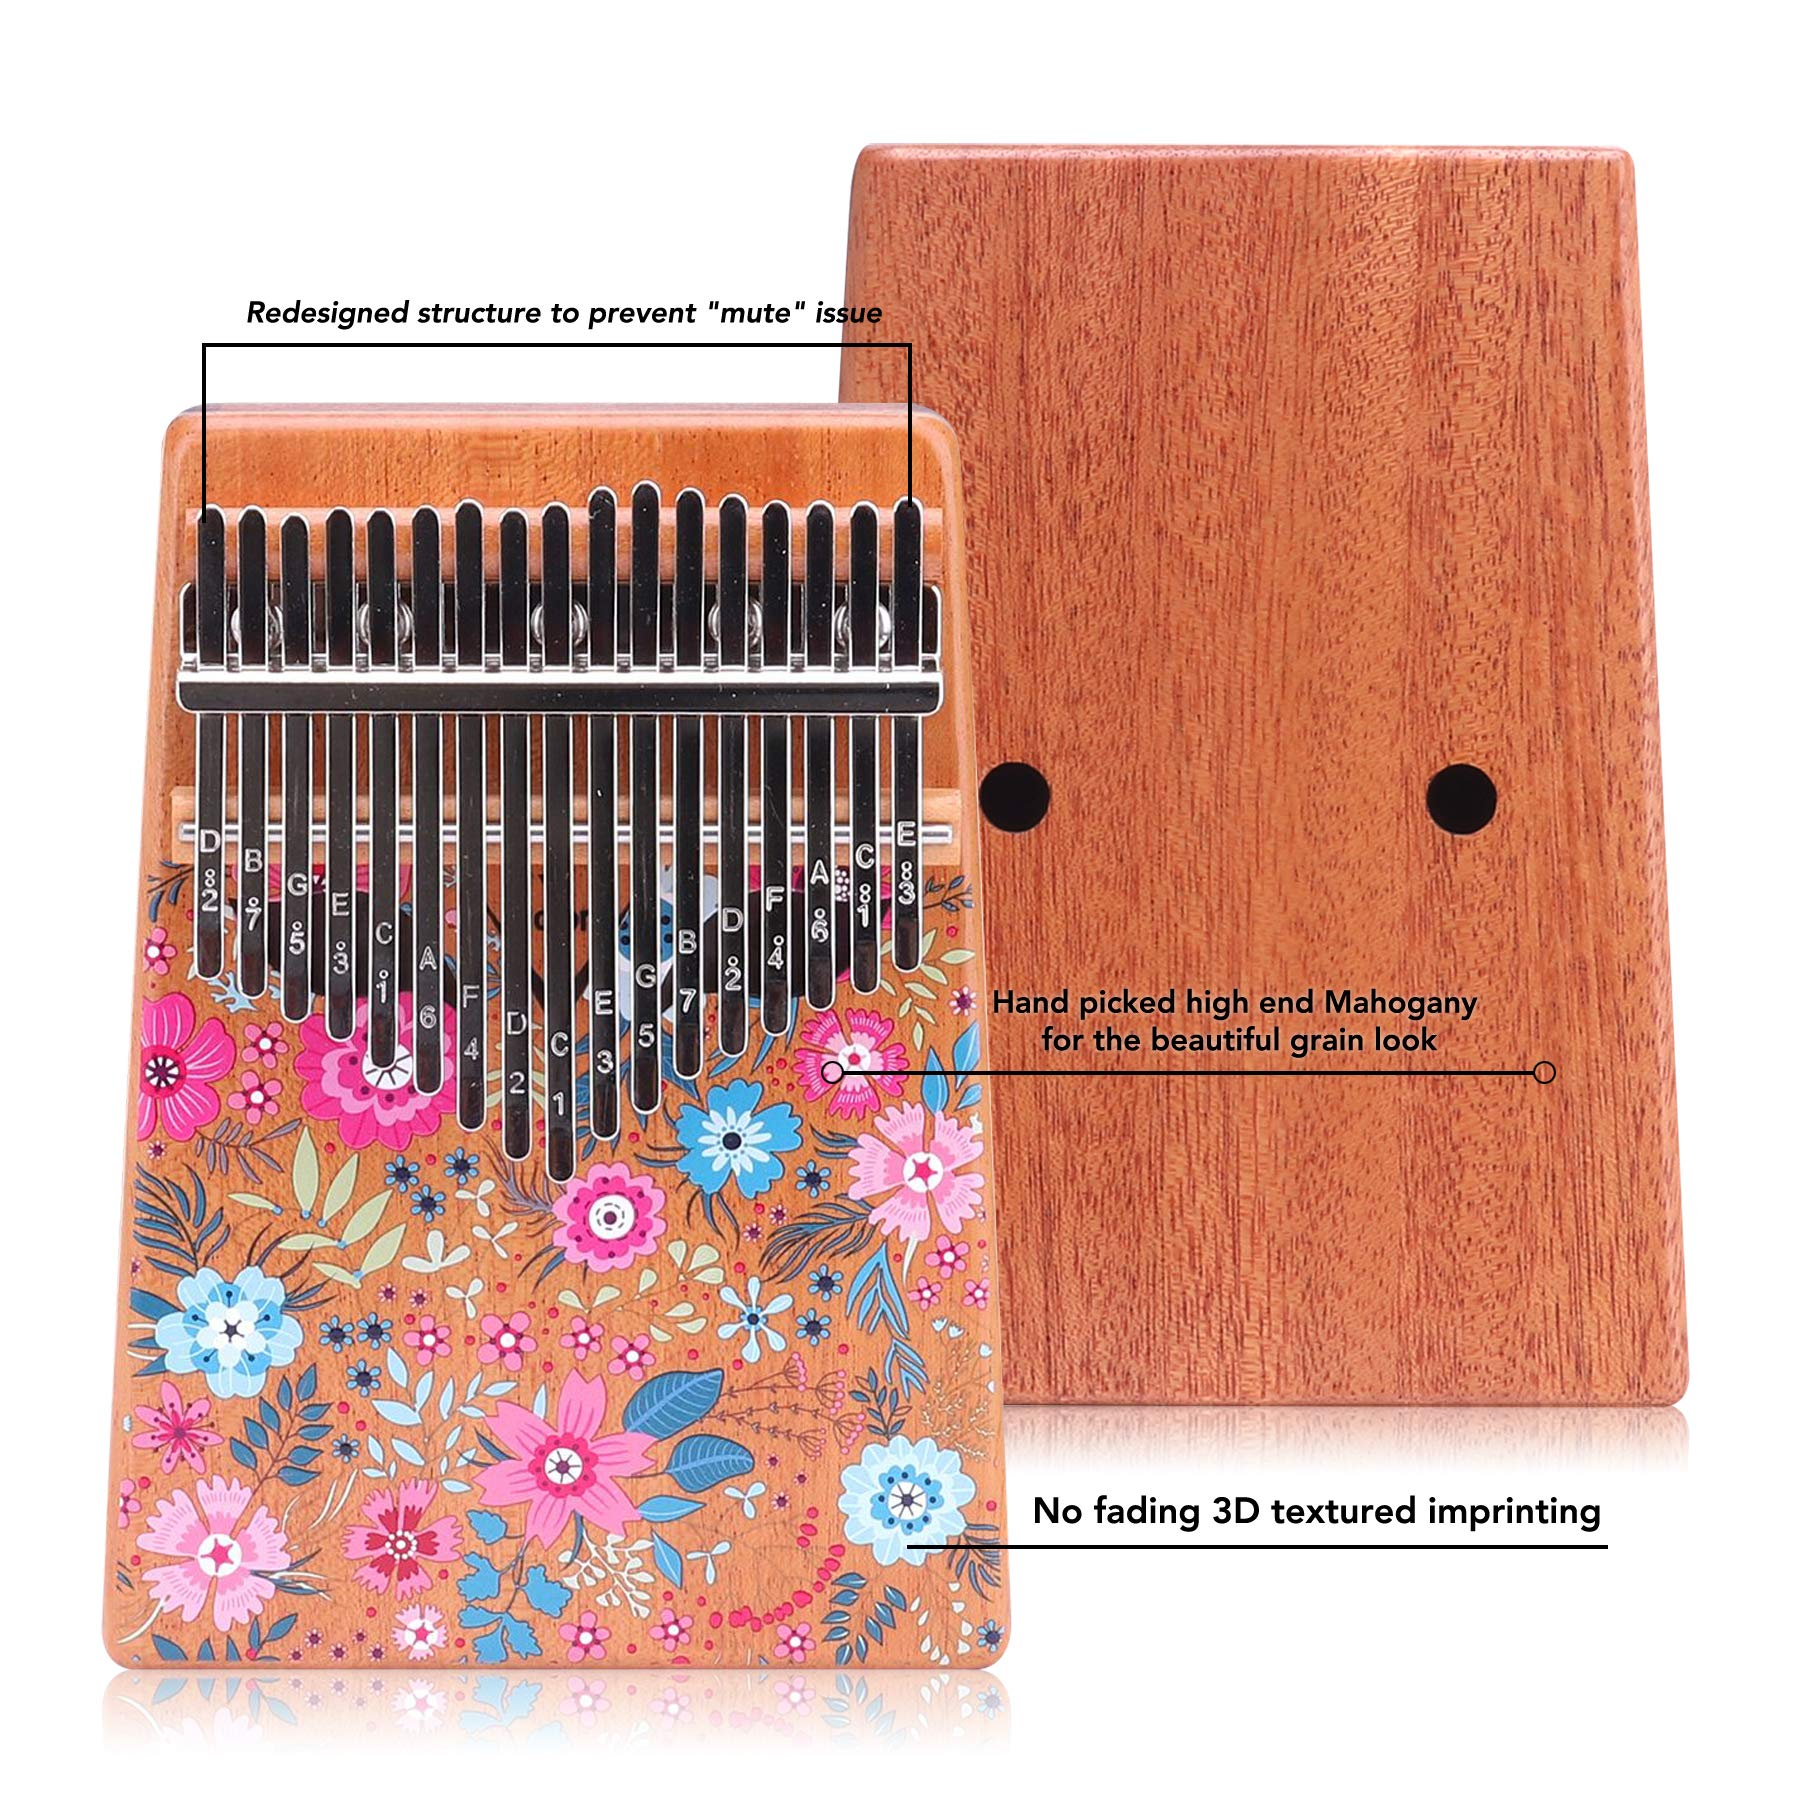 VI VICTORY 17 Key 3D Painted Kalimba African Thumb Piano Finger Percussion Keyboard Music Instruments - Sakura 2 by VI VICTORY (Image #1)